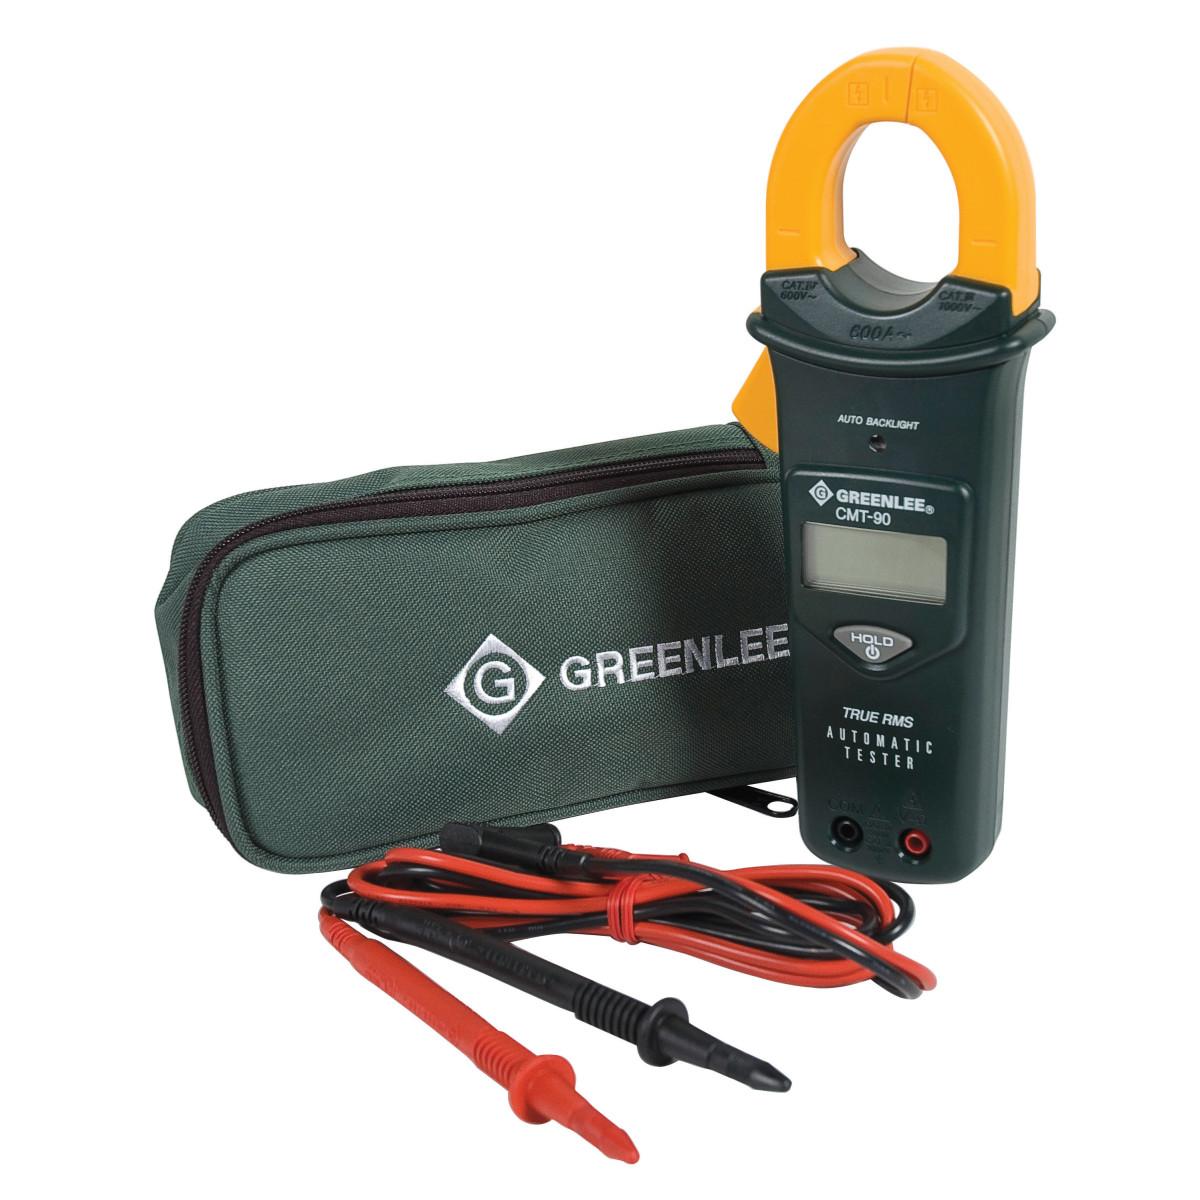 Greenlee CMT-90 1000V 600A ELECTRICAL TESTER